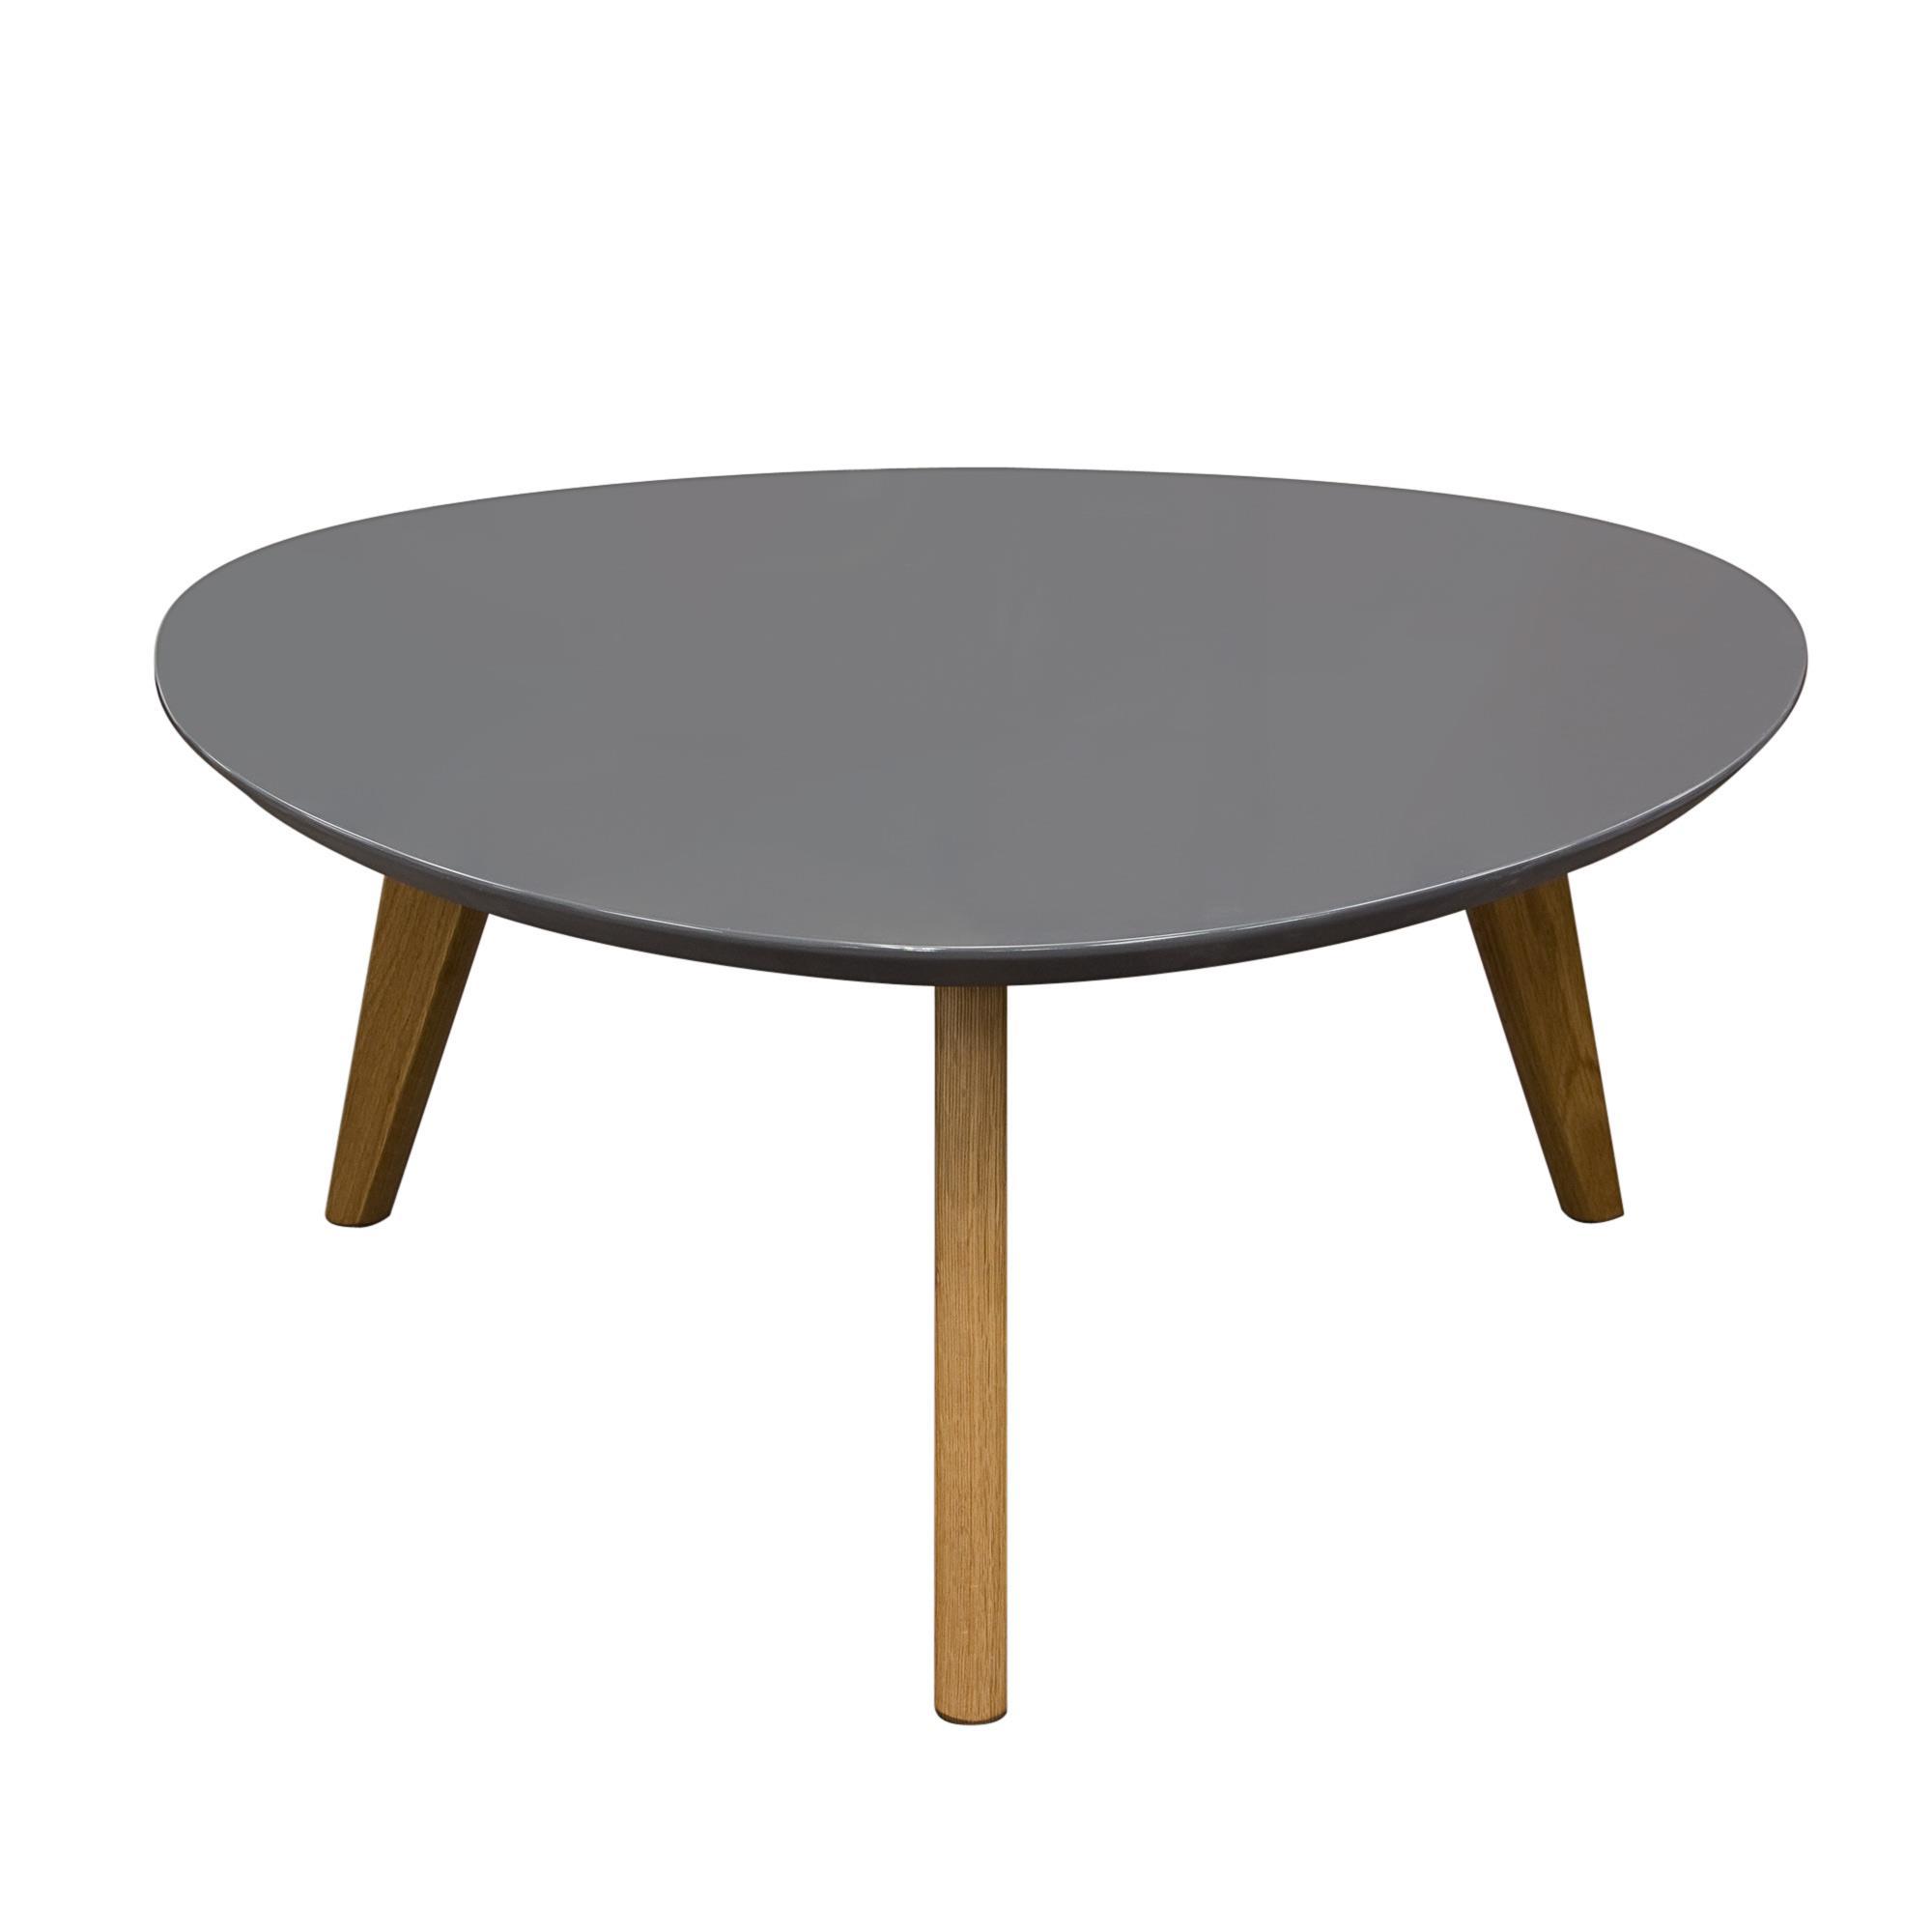 Diamond Sofa Occasional Tables & Entertainment Retro Cocktail Table - Item Number: TRIOCTGR